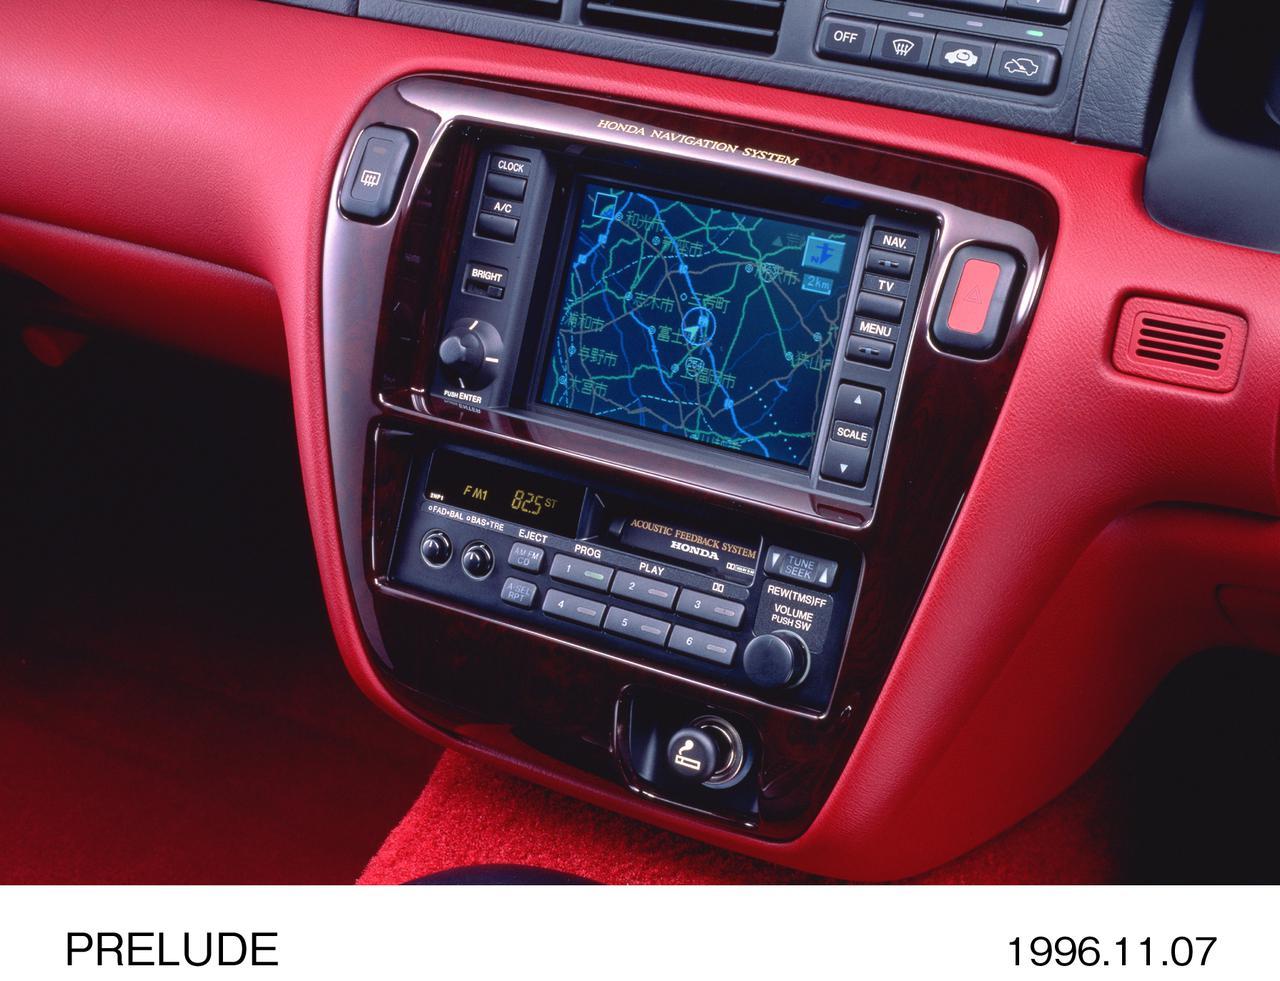 Images : 2番目の画像 - ホンダ プレリュード関連画像(クリックして拡大) - A Little Honda   ア・リトル・ホンダ(リトホン)